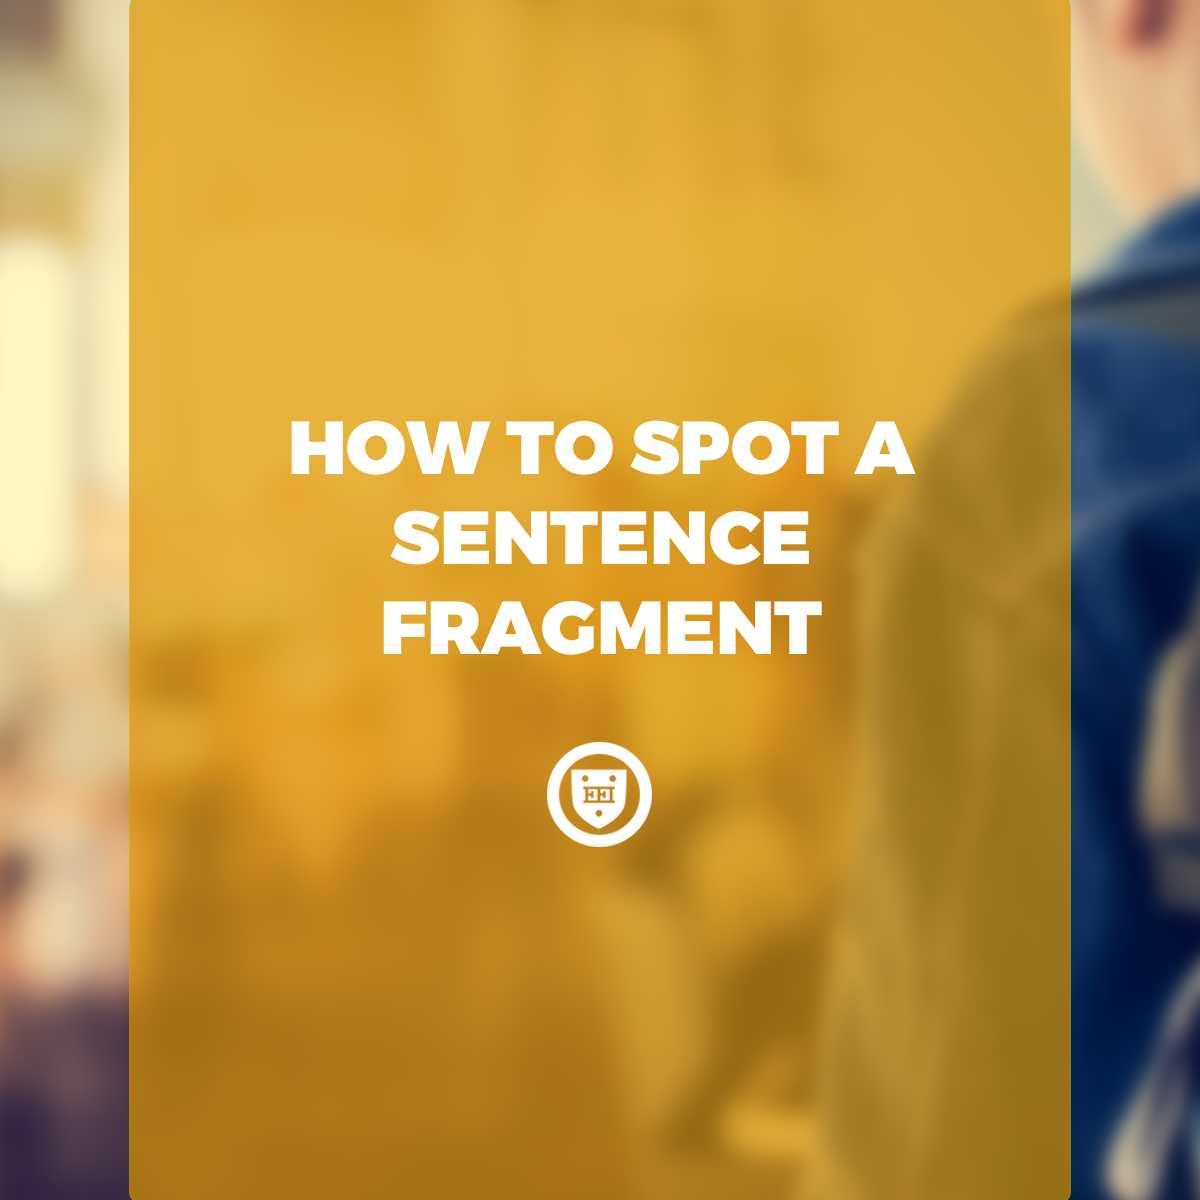 How to Spot a Sentence Fragment